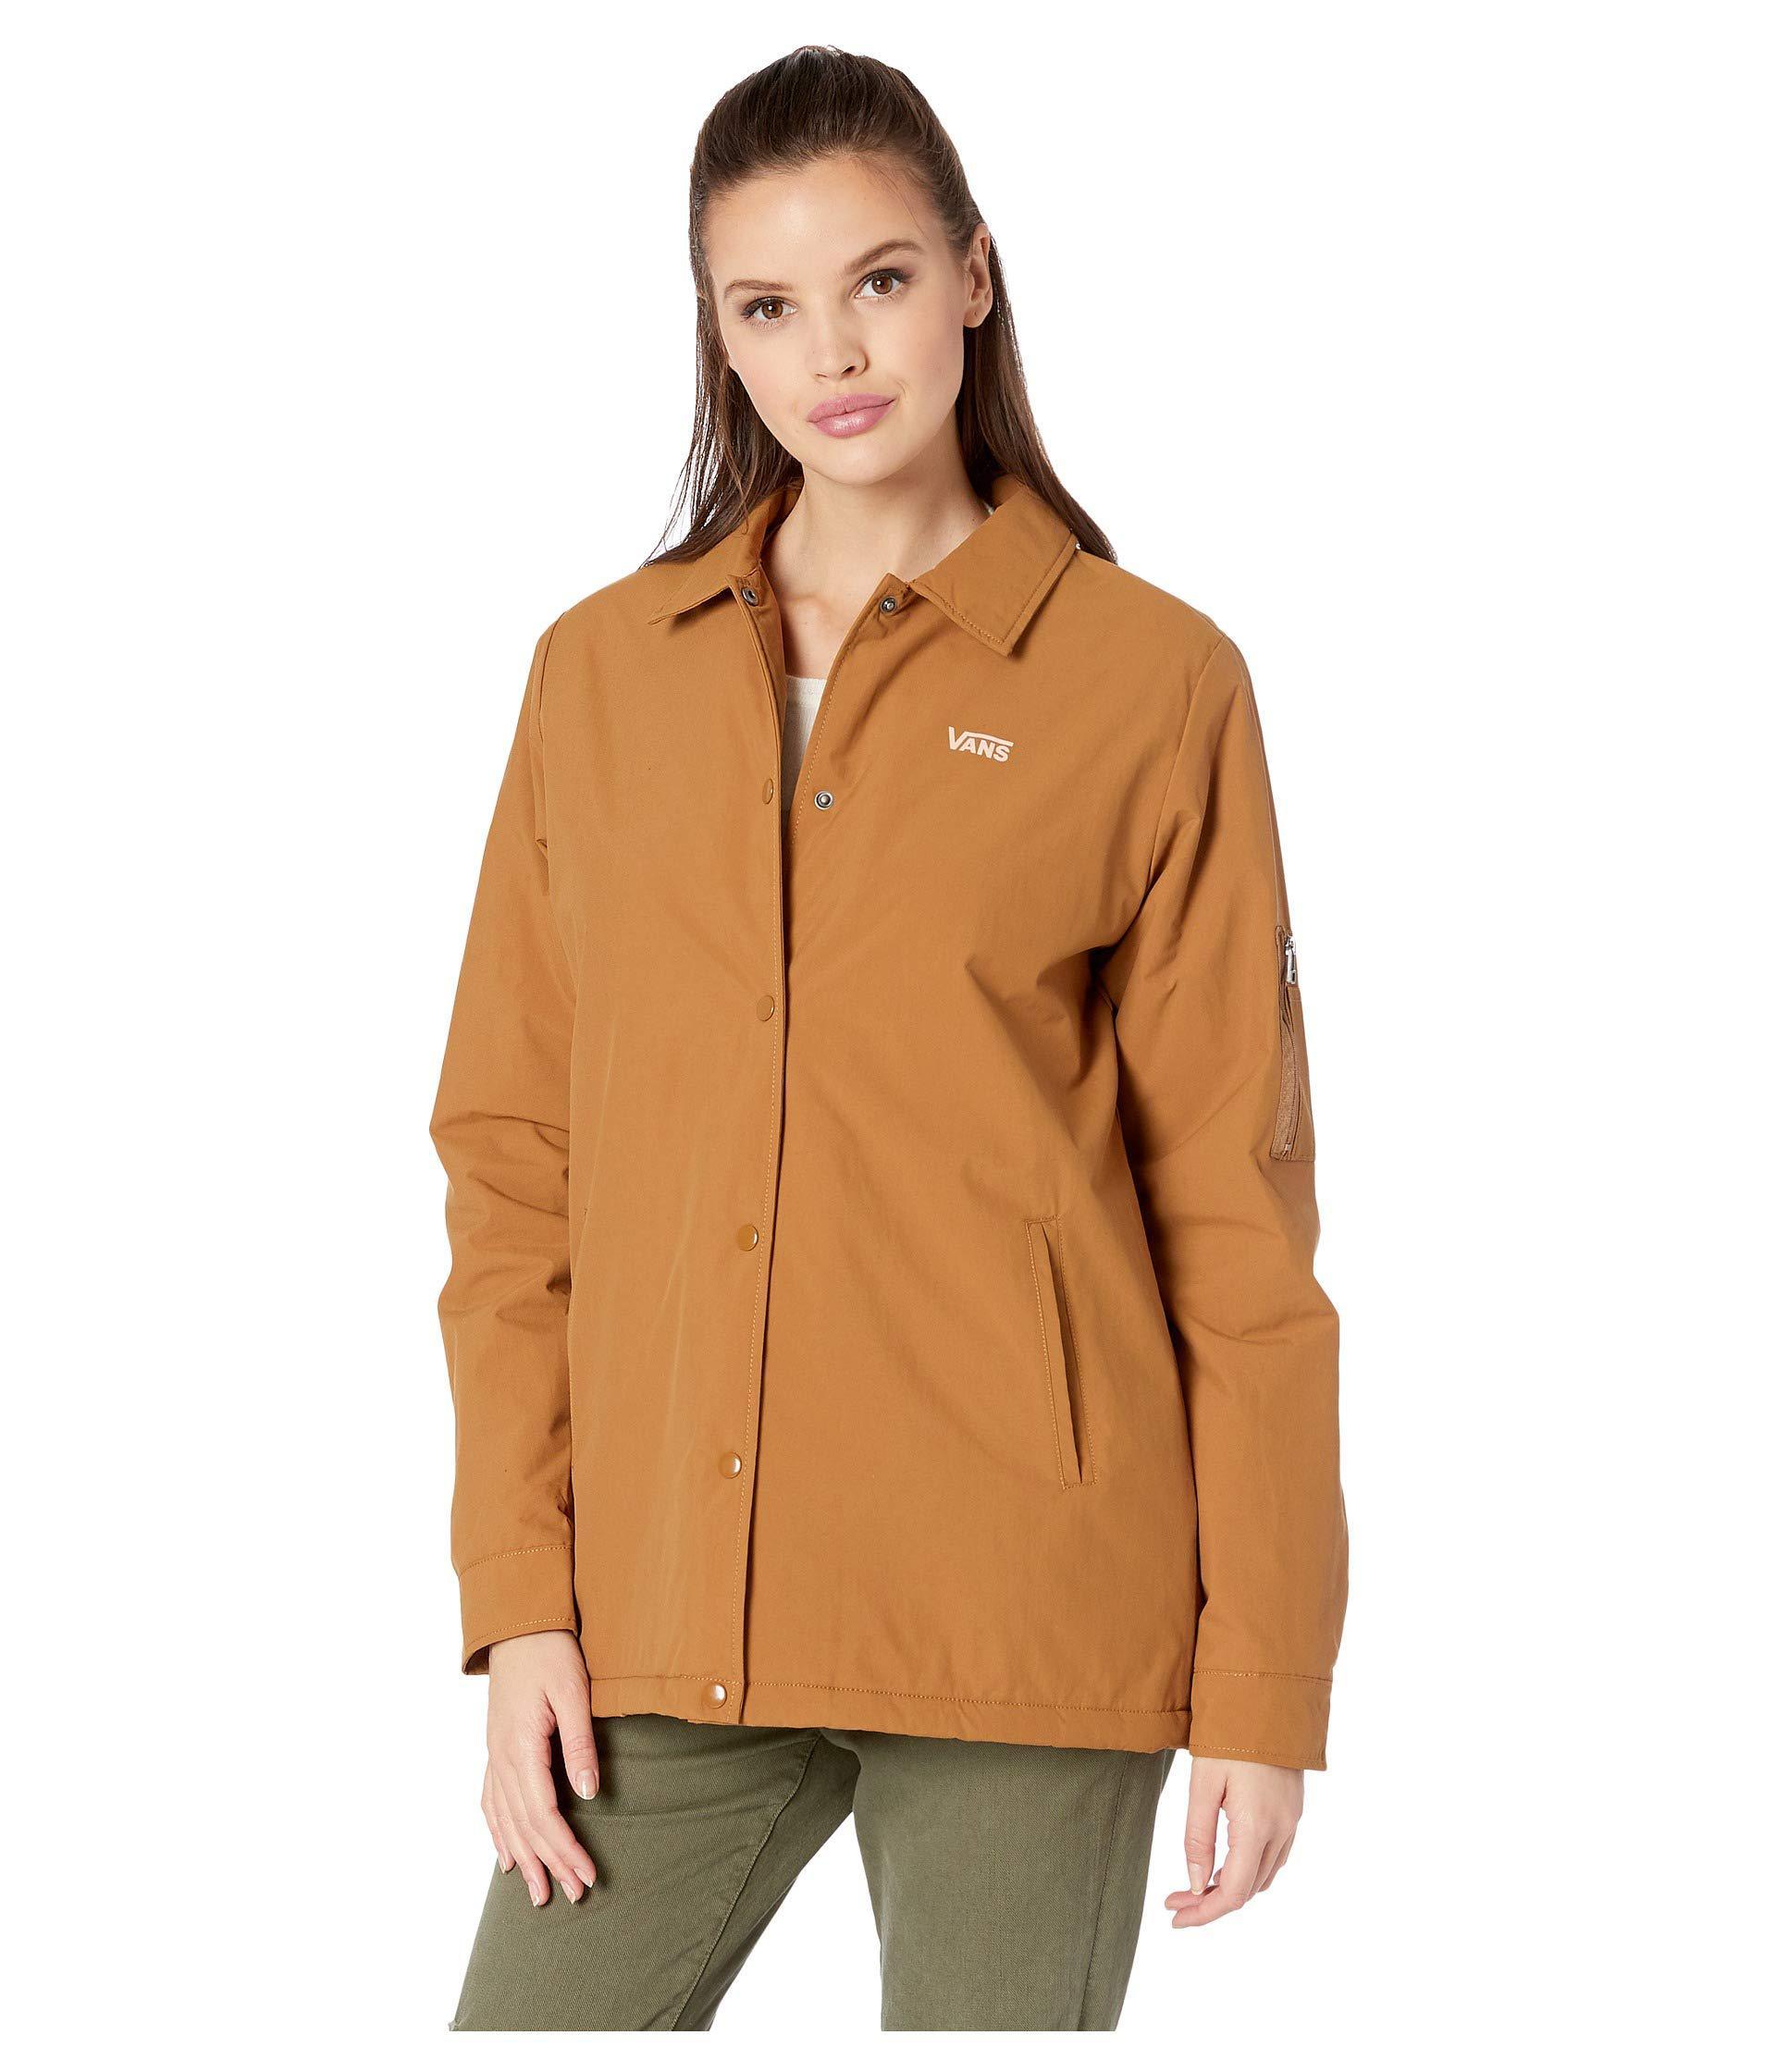 8761c66a7a8 Lyst - Vans Thanks Coach Sherpa Mte (rubber) Women s Coat in Brown